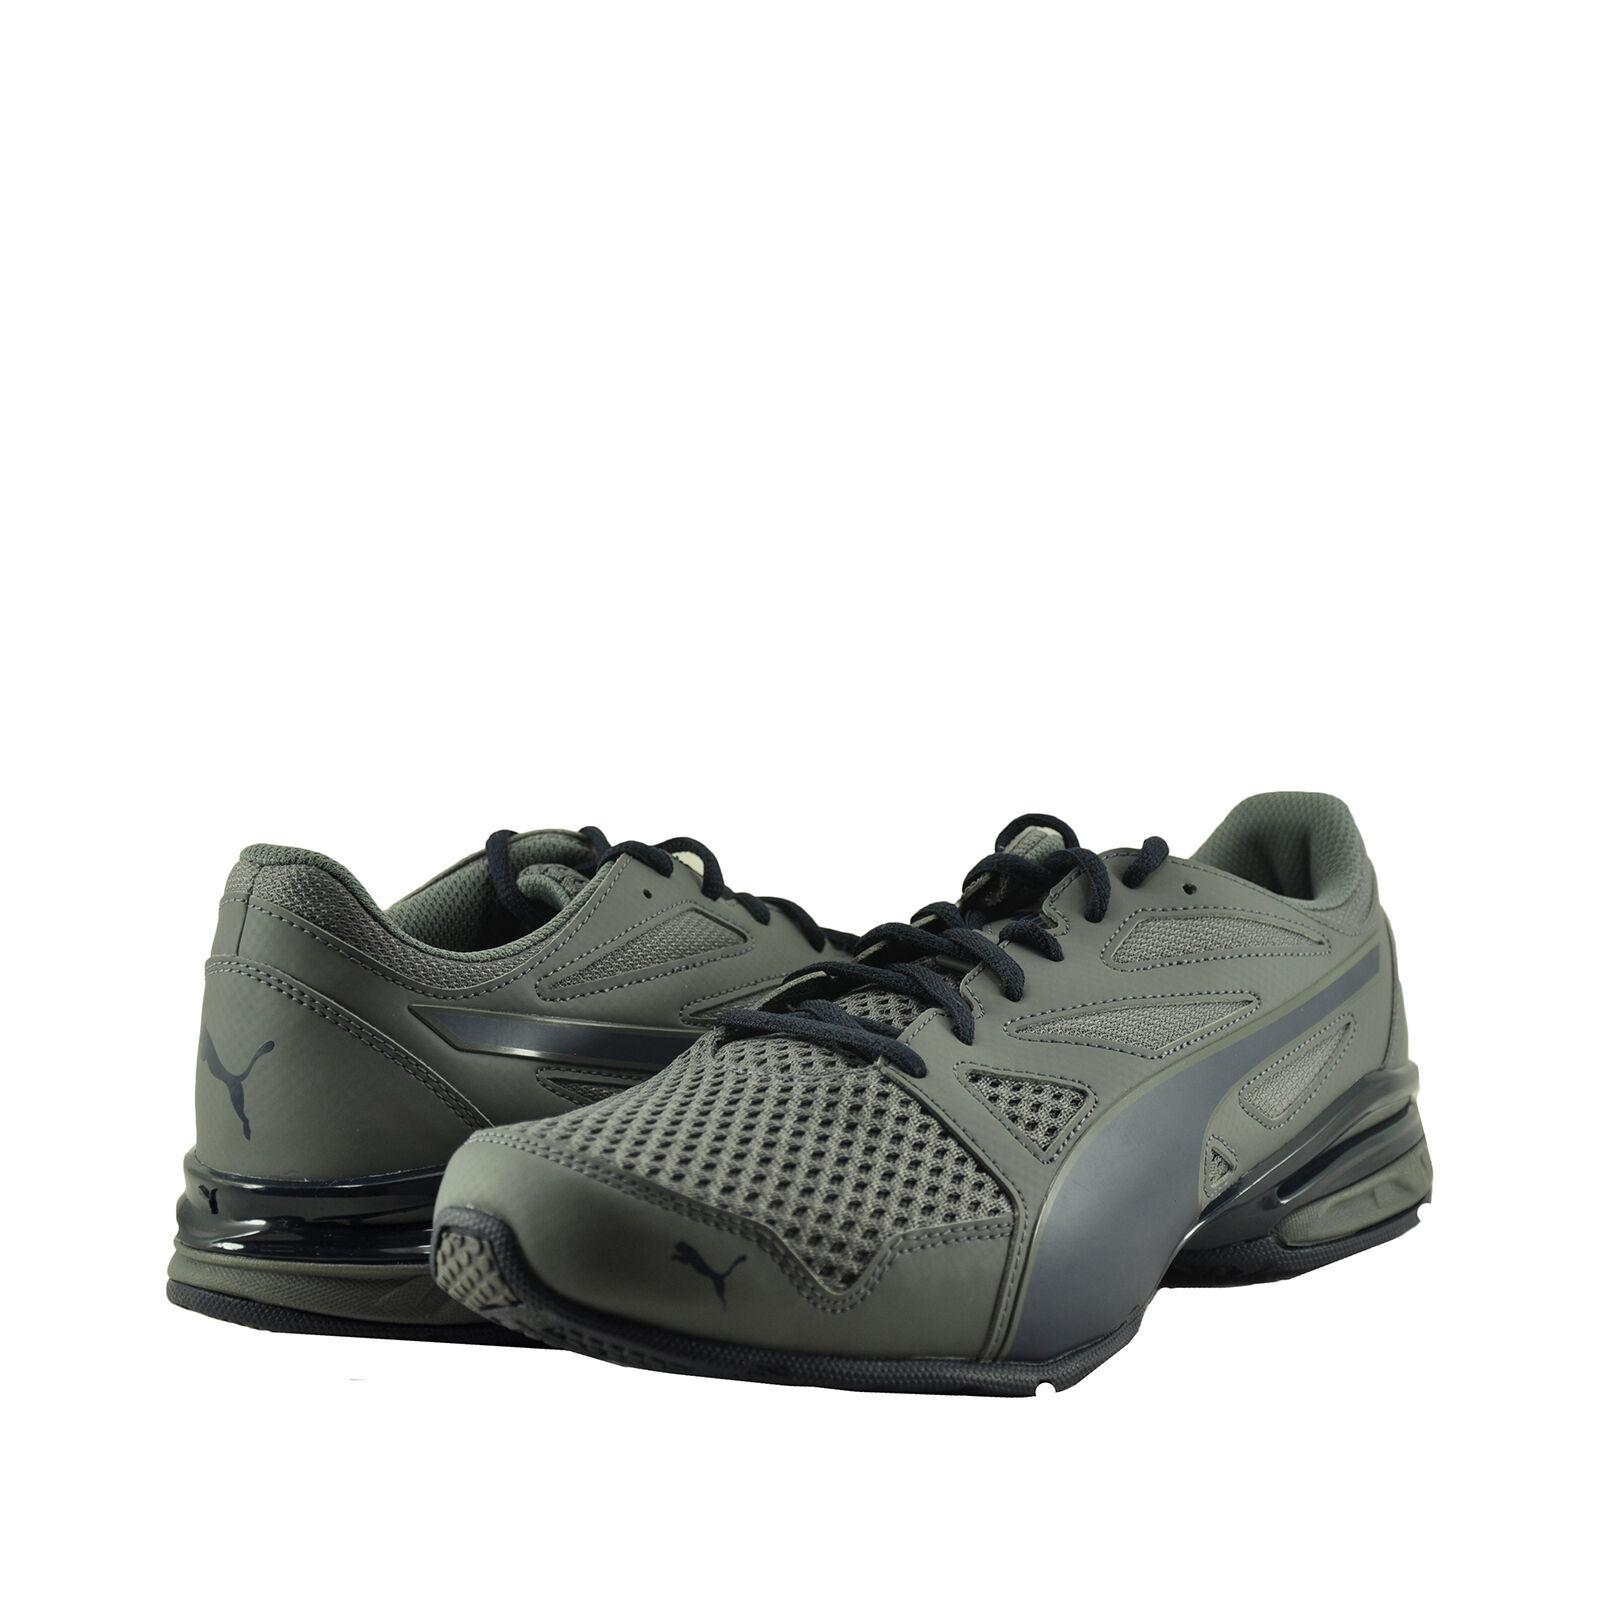 Men's Shoes PUMA Tazon Modern V2 FM Sneaker 190364-01 Quiet Shade Peacoat  *New*